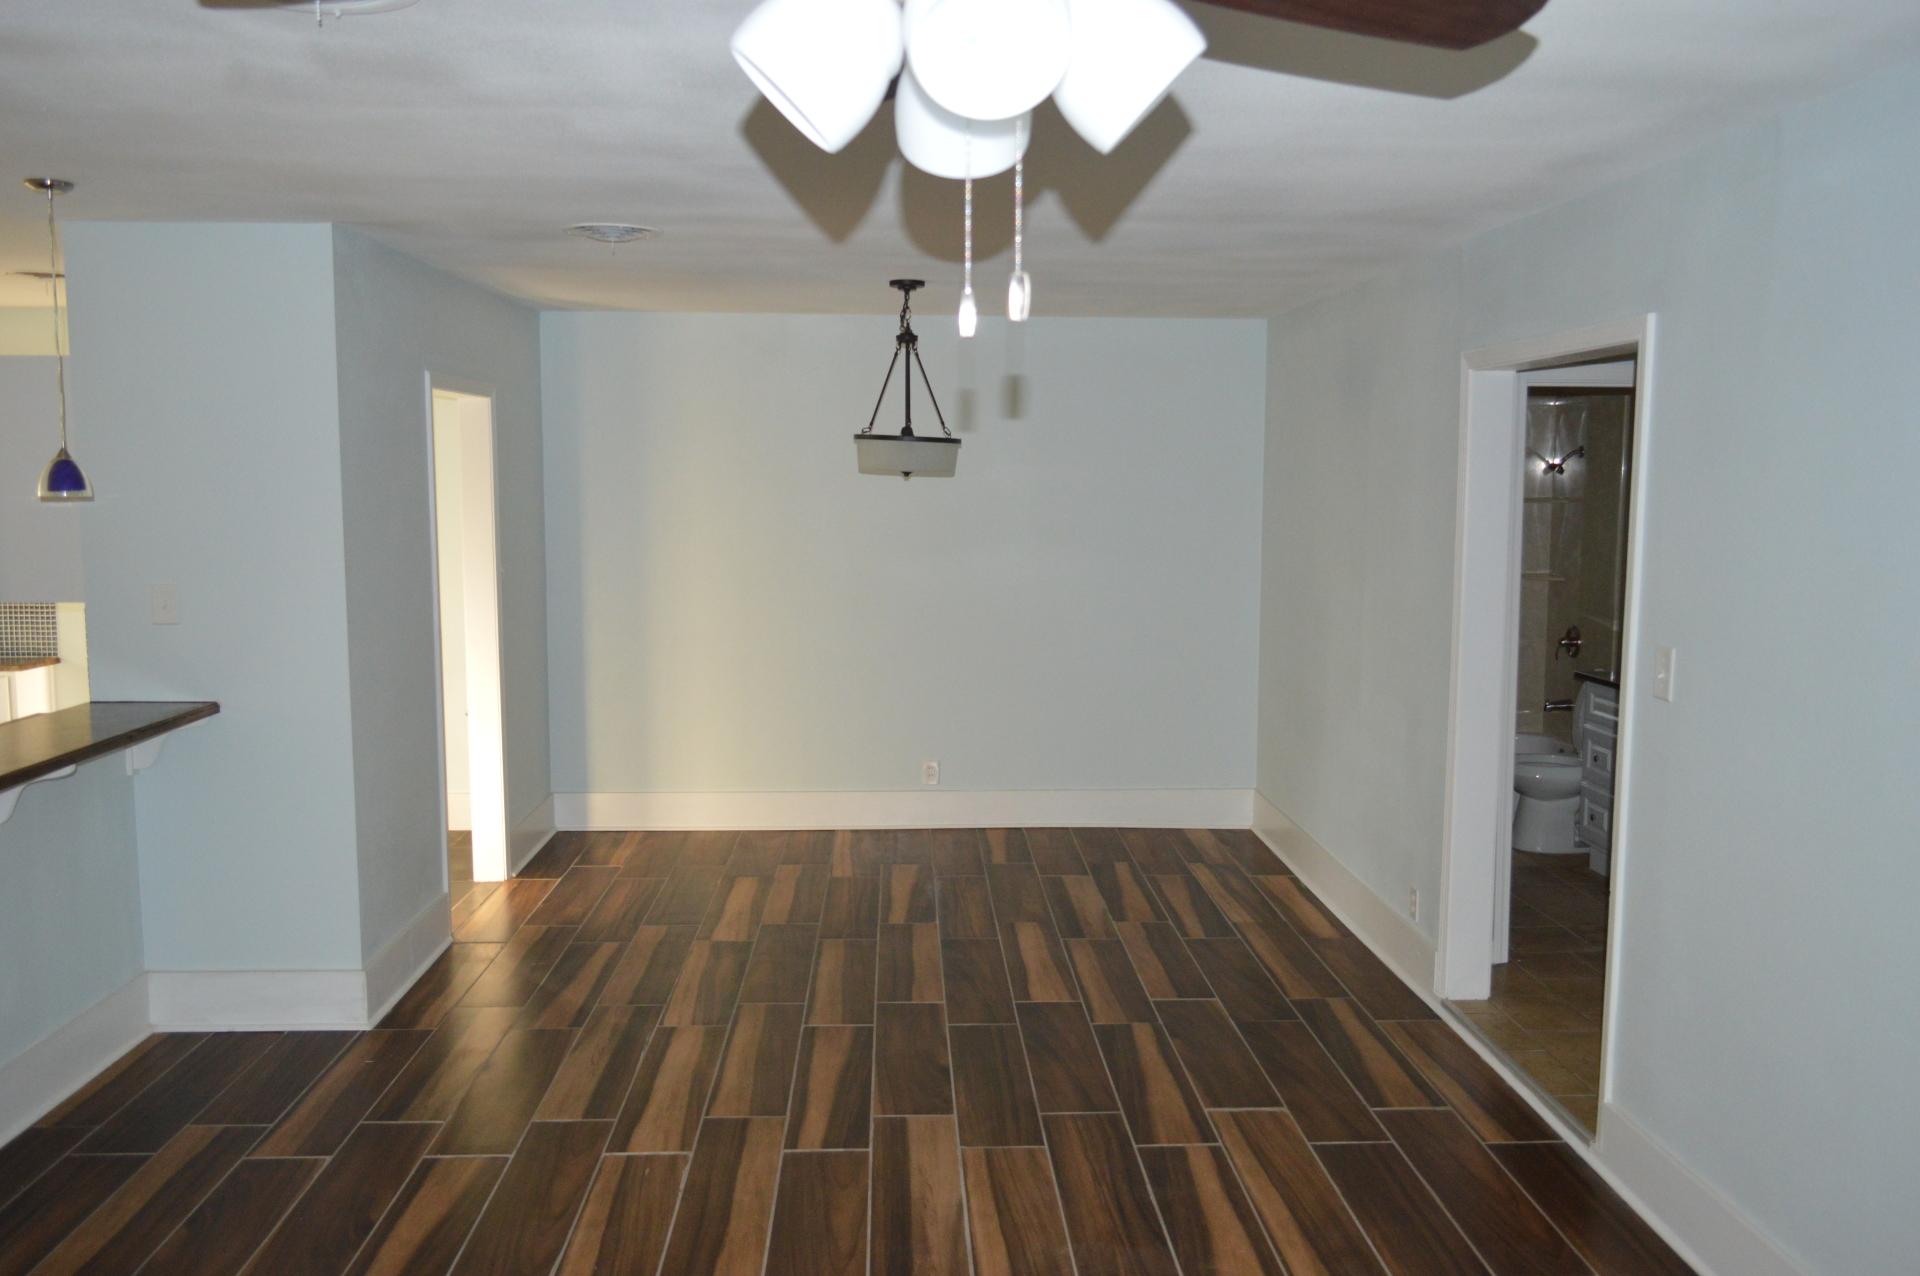 Avella Ultra Wood Grain Ceramic Tile and Summer Sky Walls